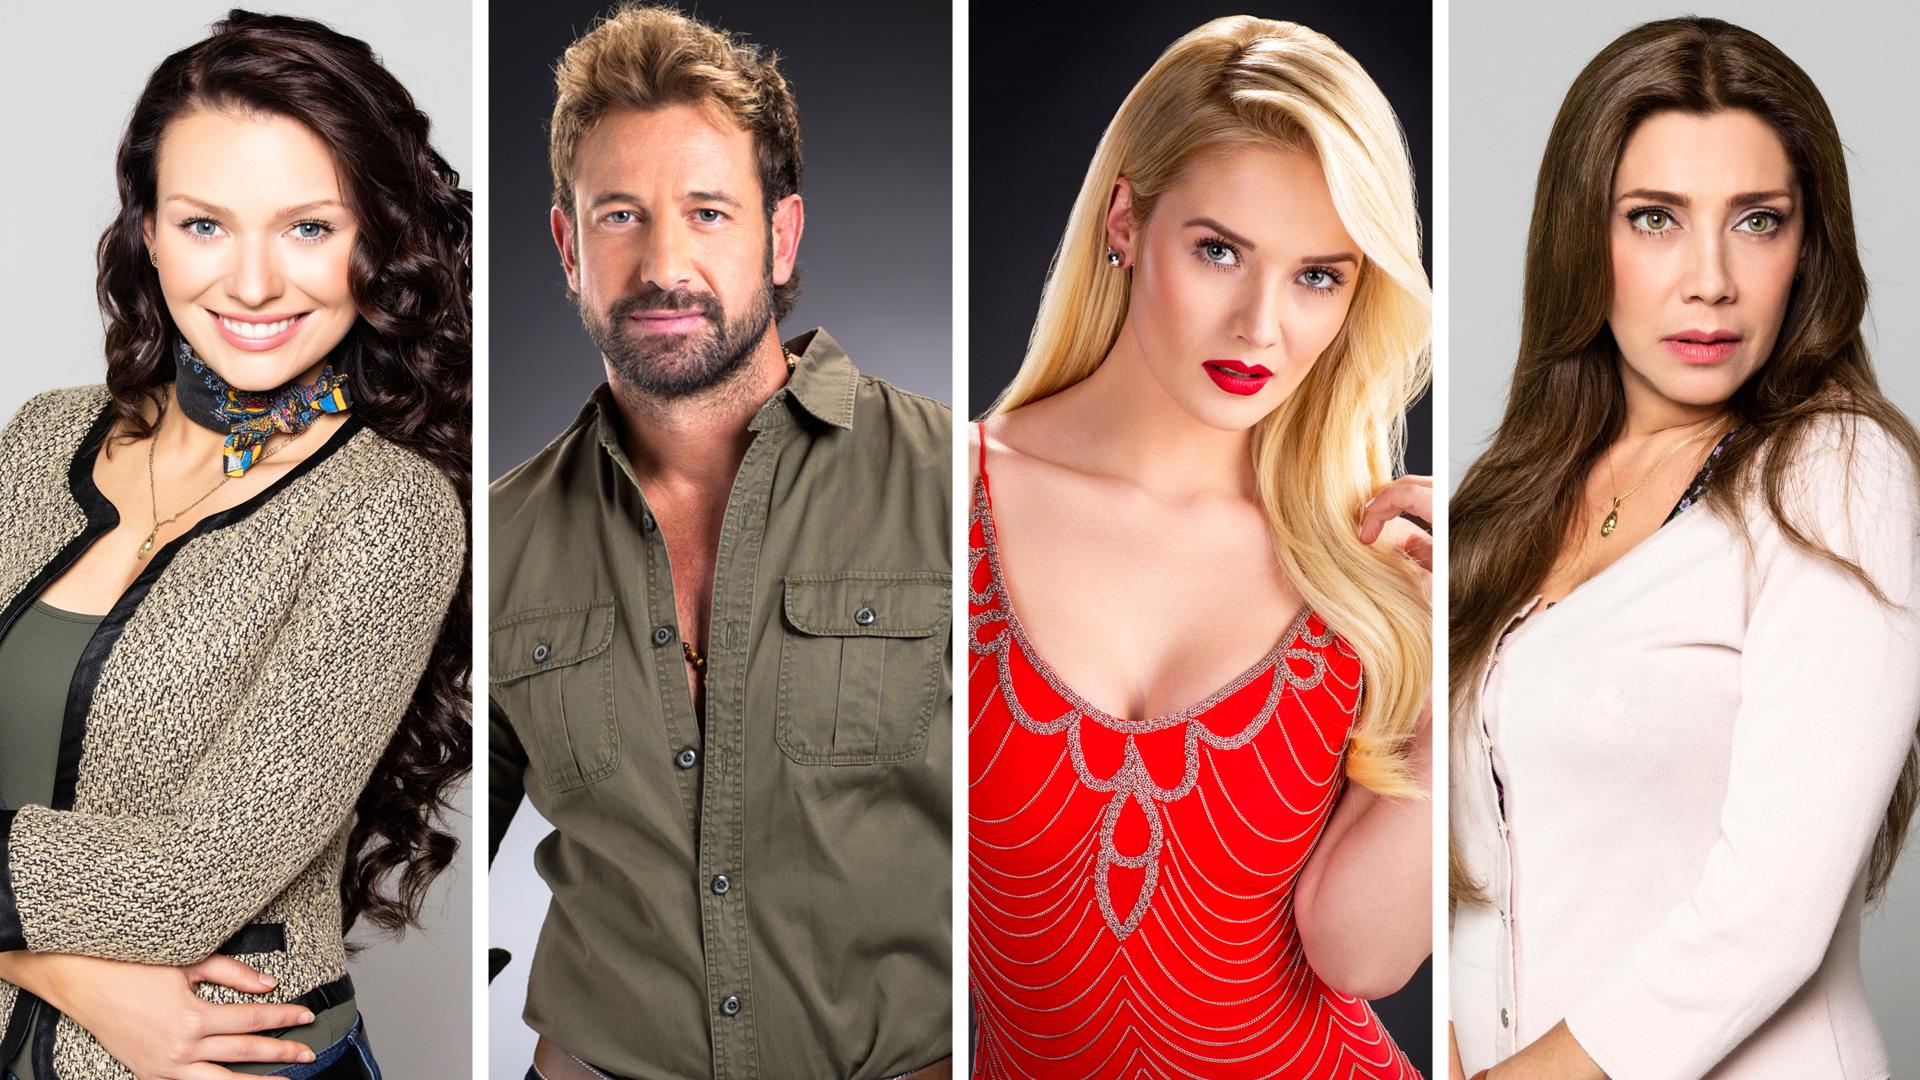 Vota Por Tus Personajes Favoritos De Vino El Amor Vino El Amor